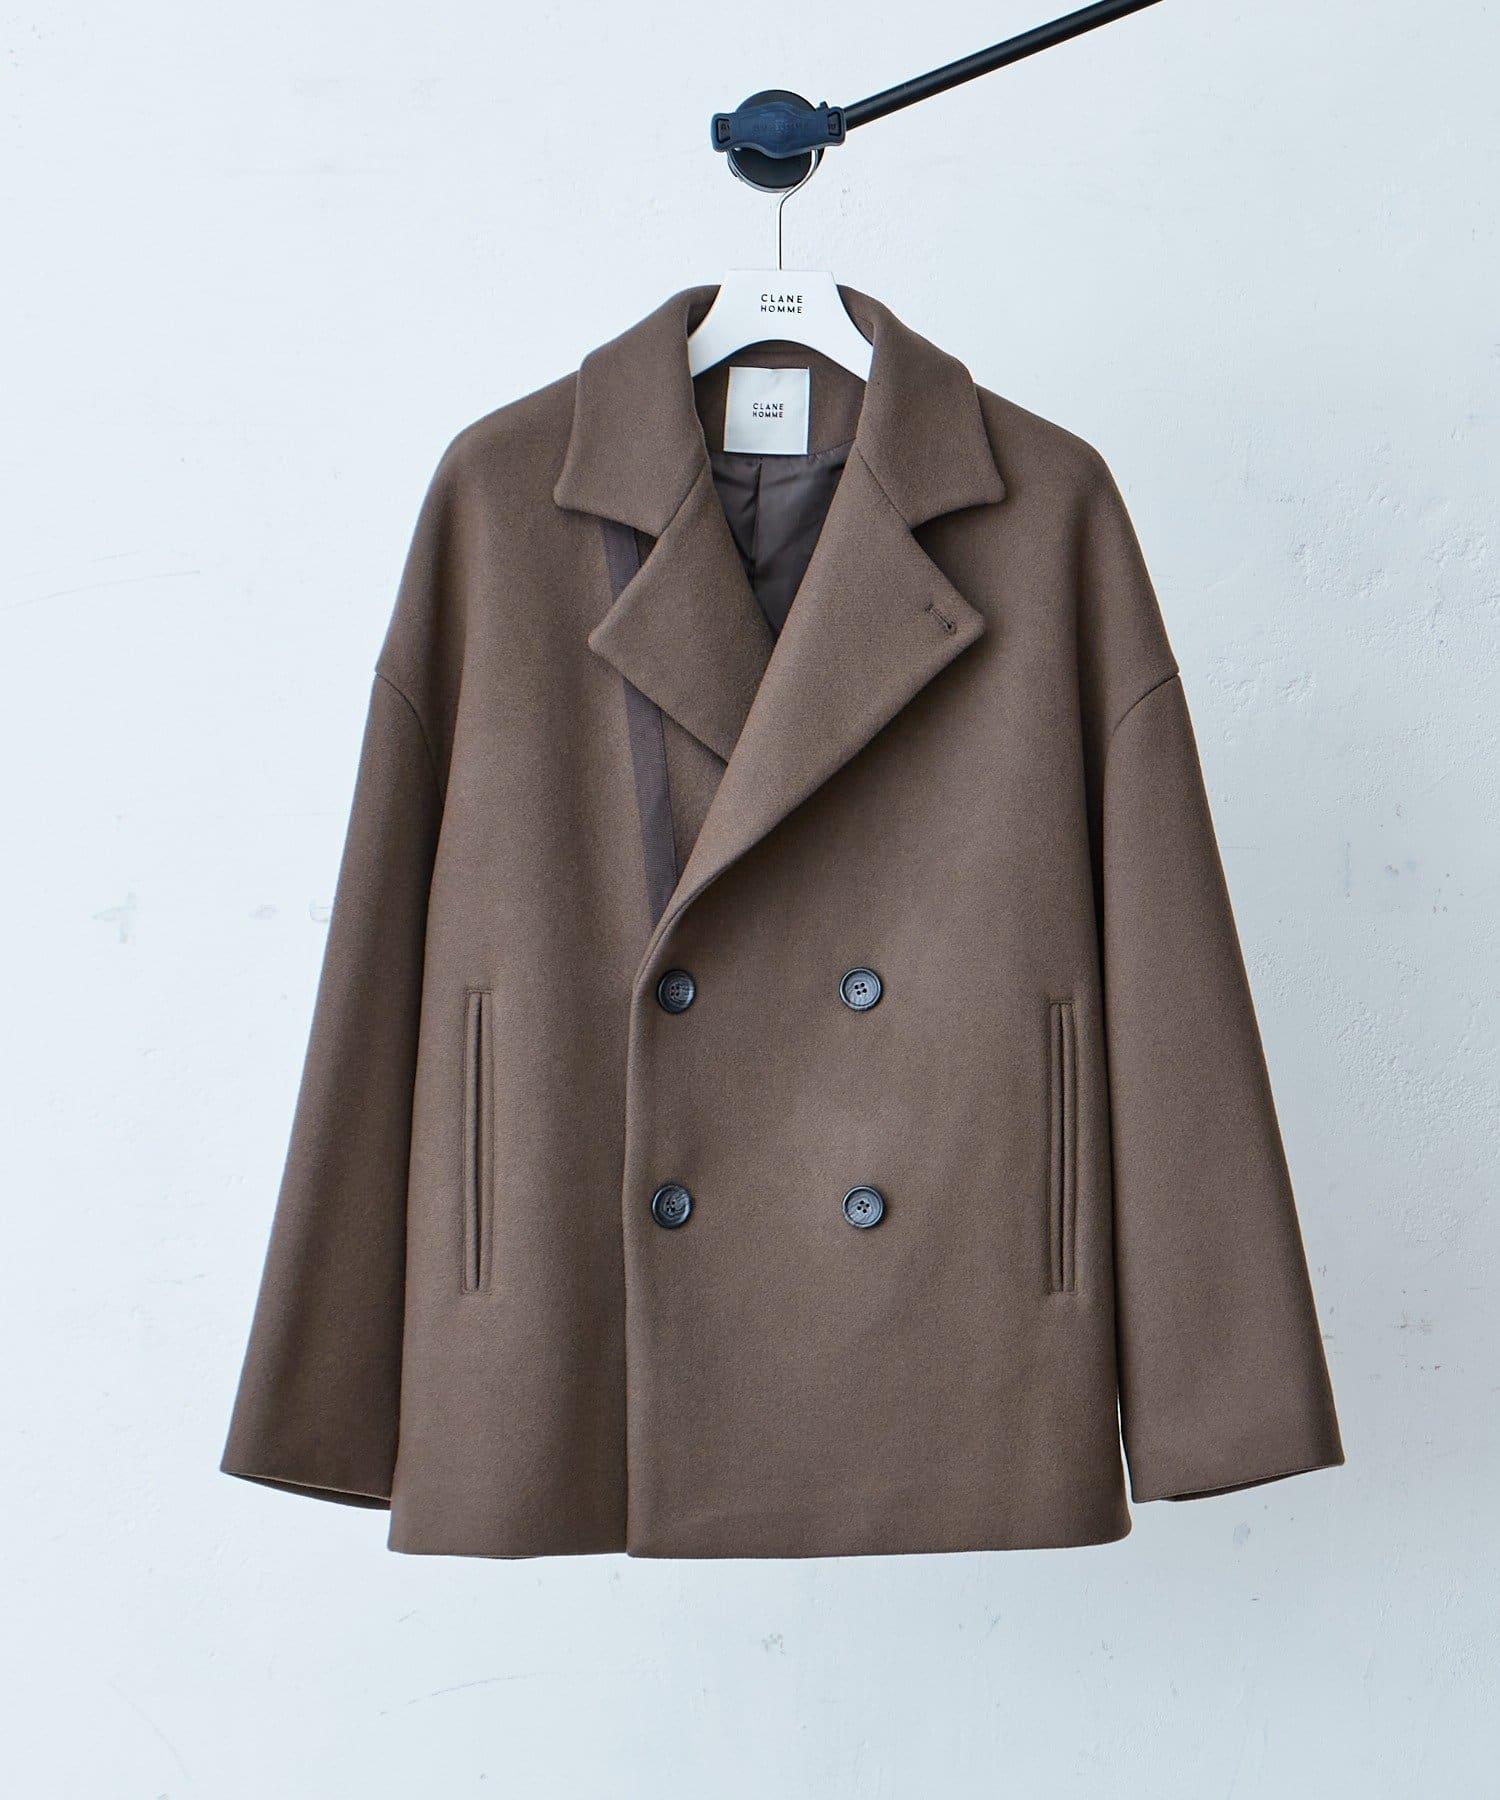 Lui's(ルイス) 【CLANE HOMME Exclusive】Short Double Coat